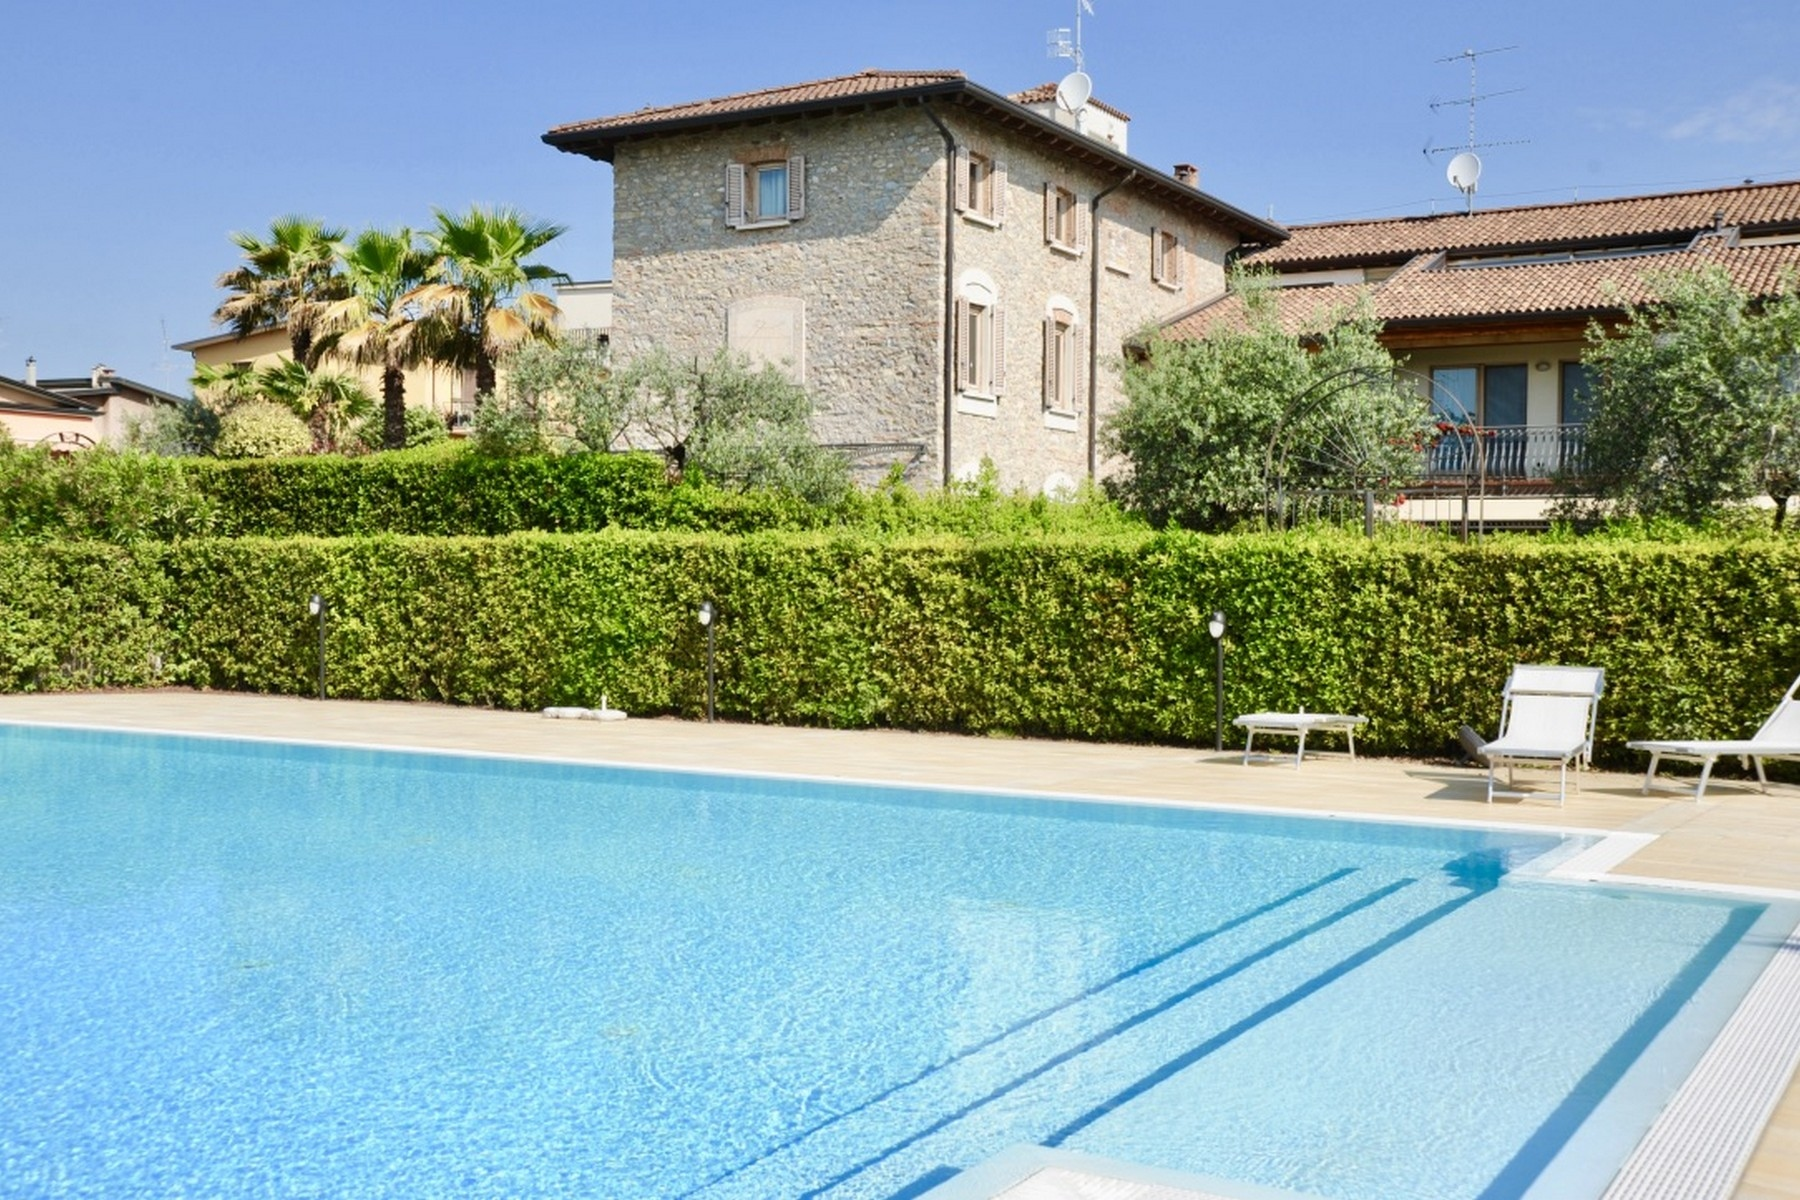 Casa indipendente in Vendita a Desenzano Del Garda via san benedetto